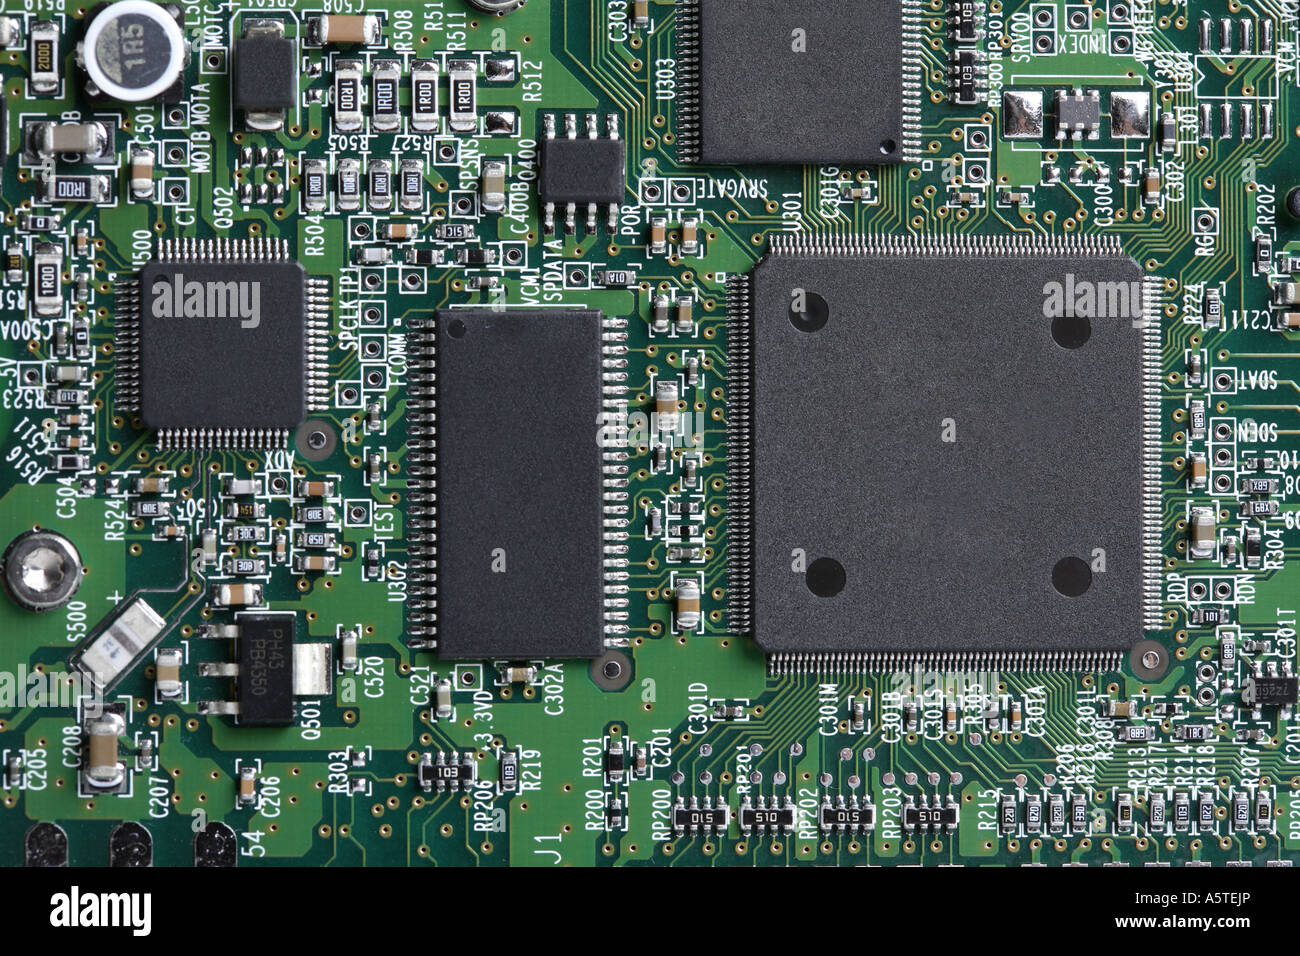 Computer Circuit Board - Stock Image